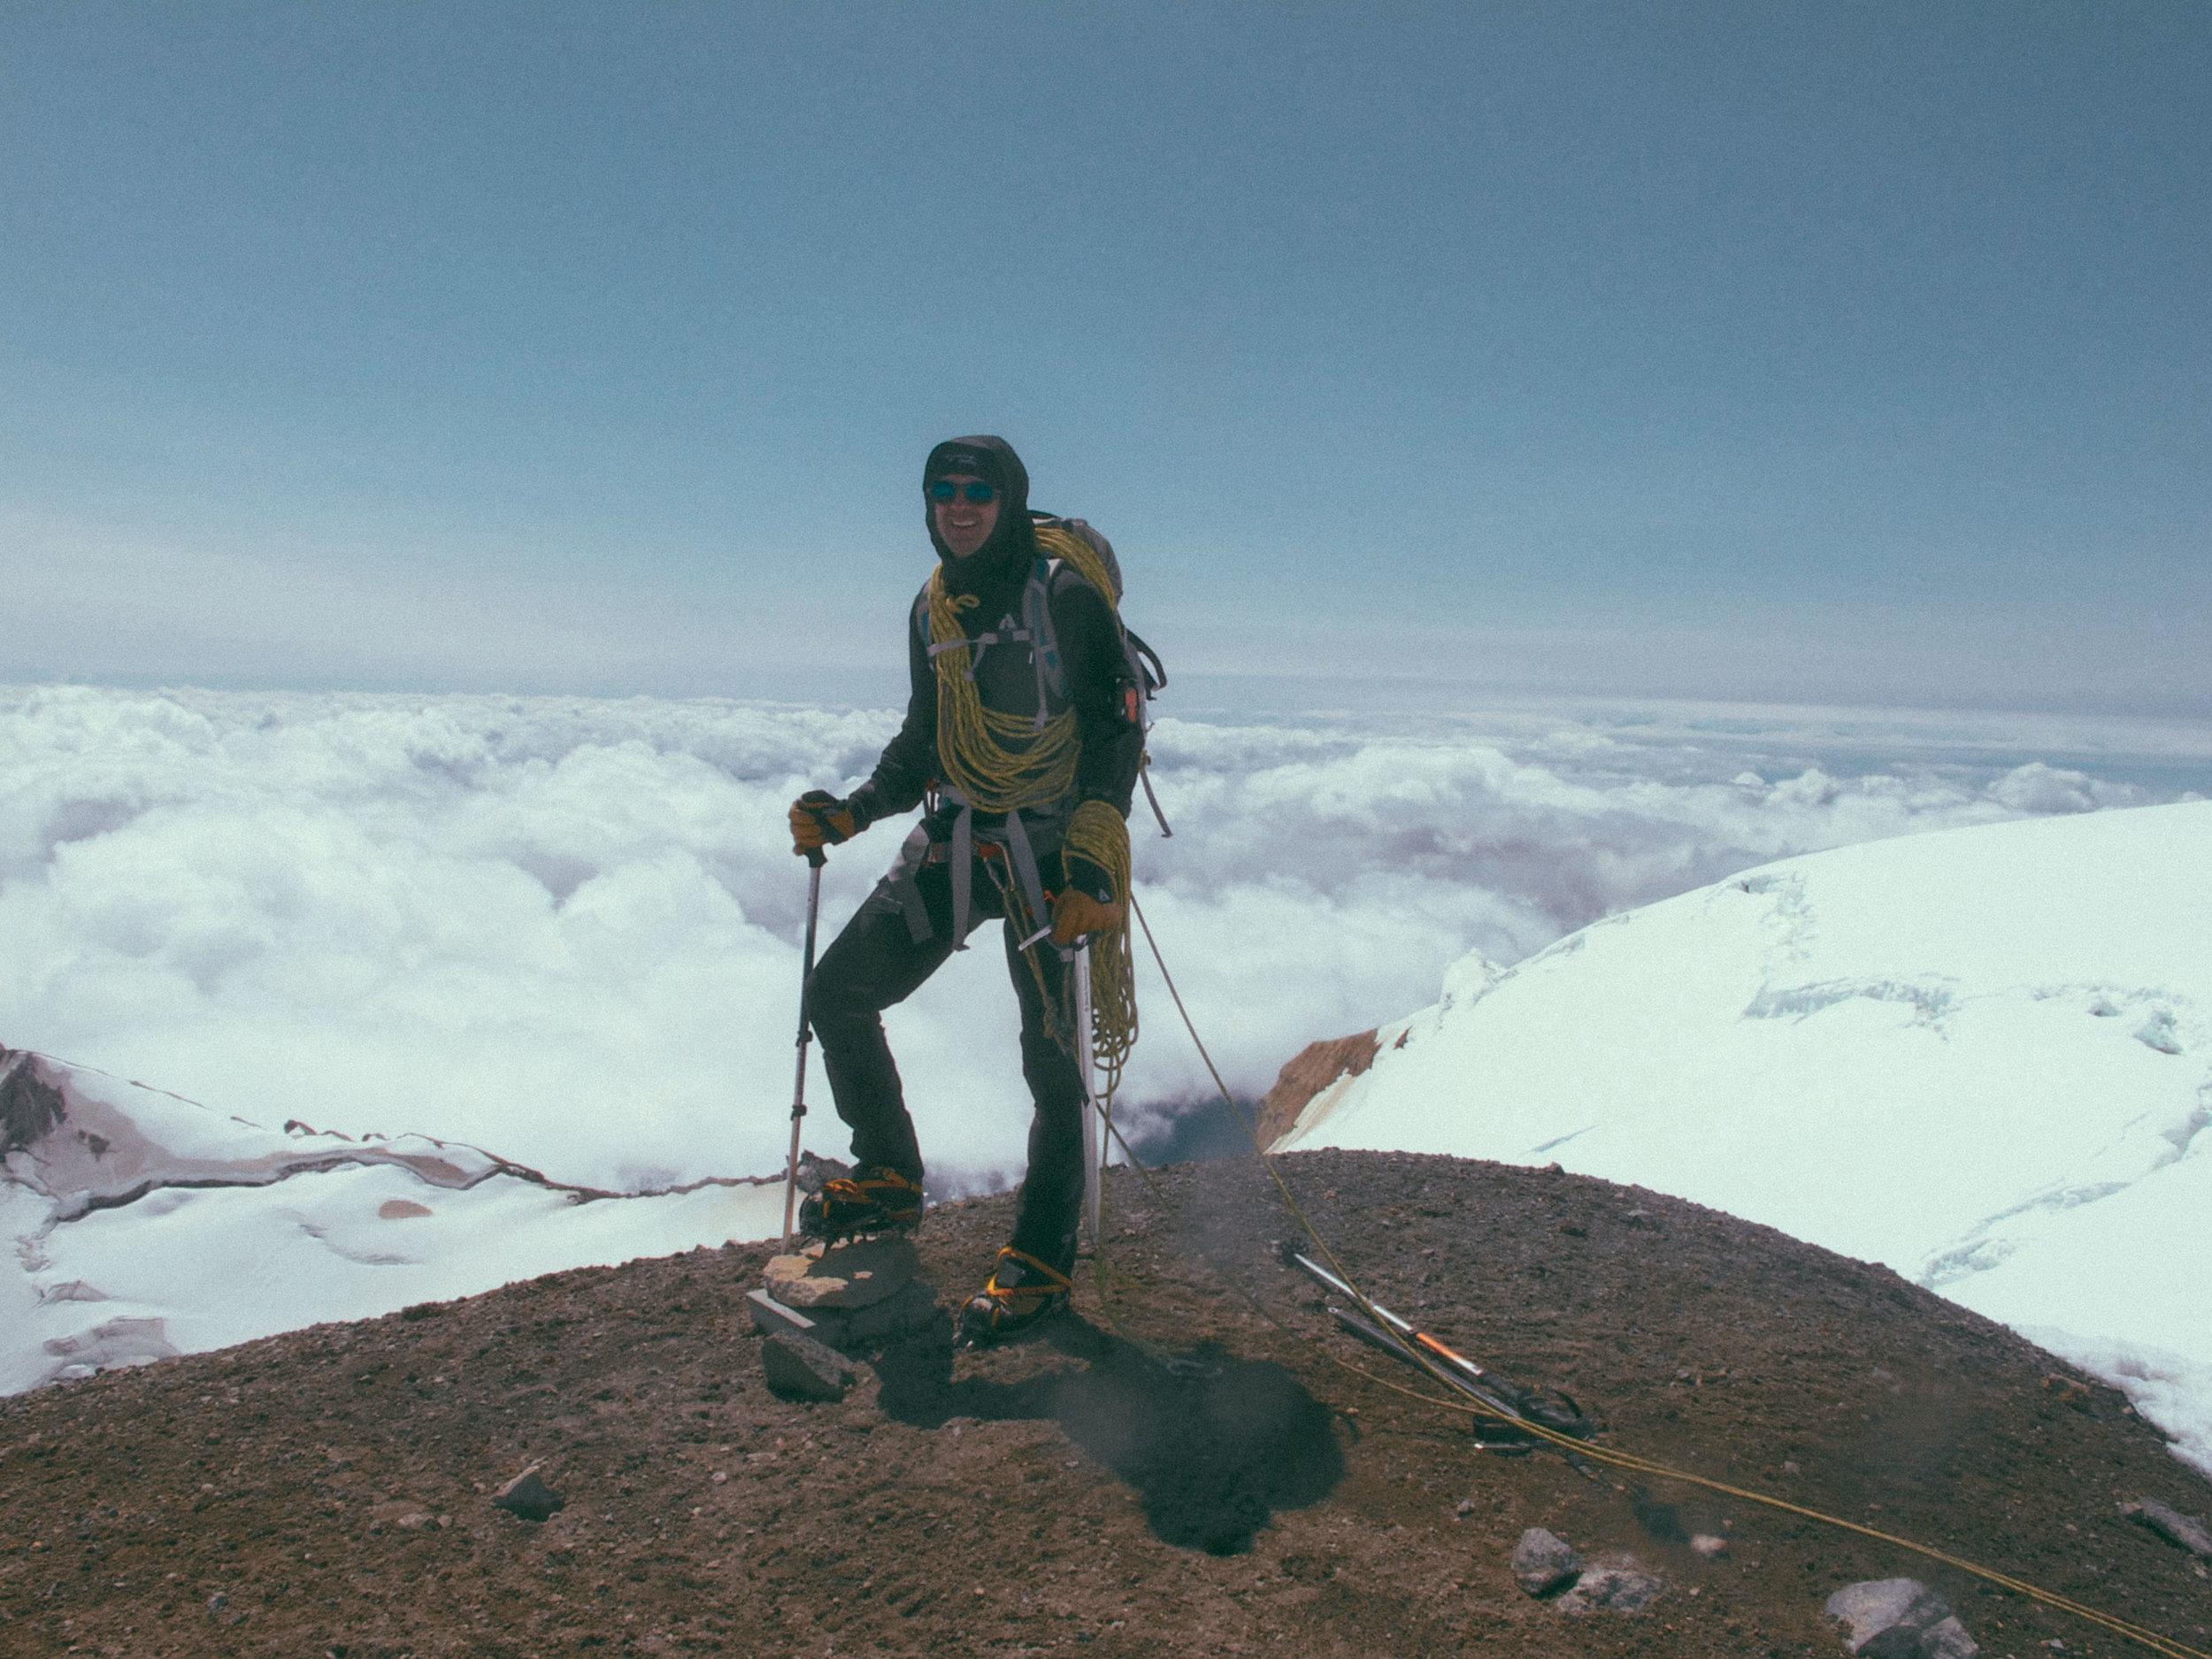 On the Summit of Mt. Baker